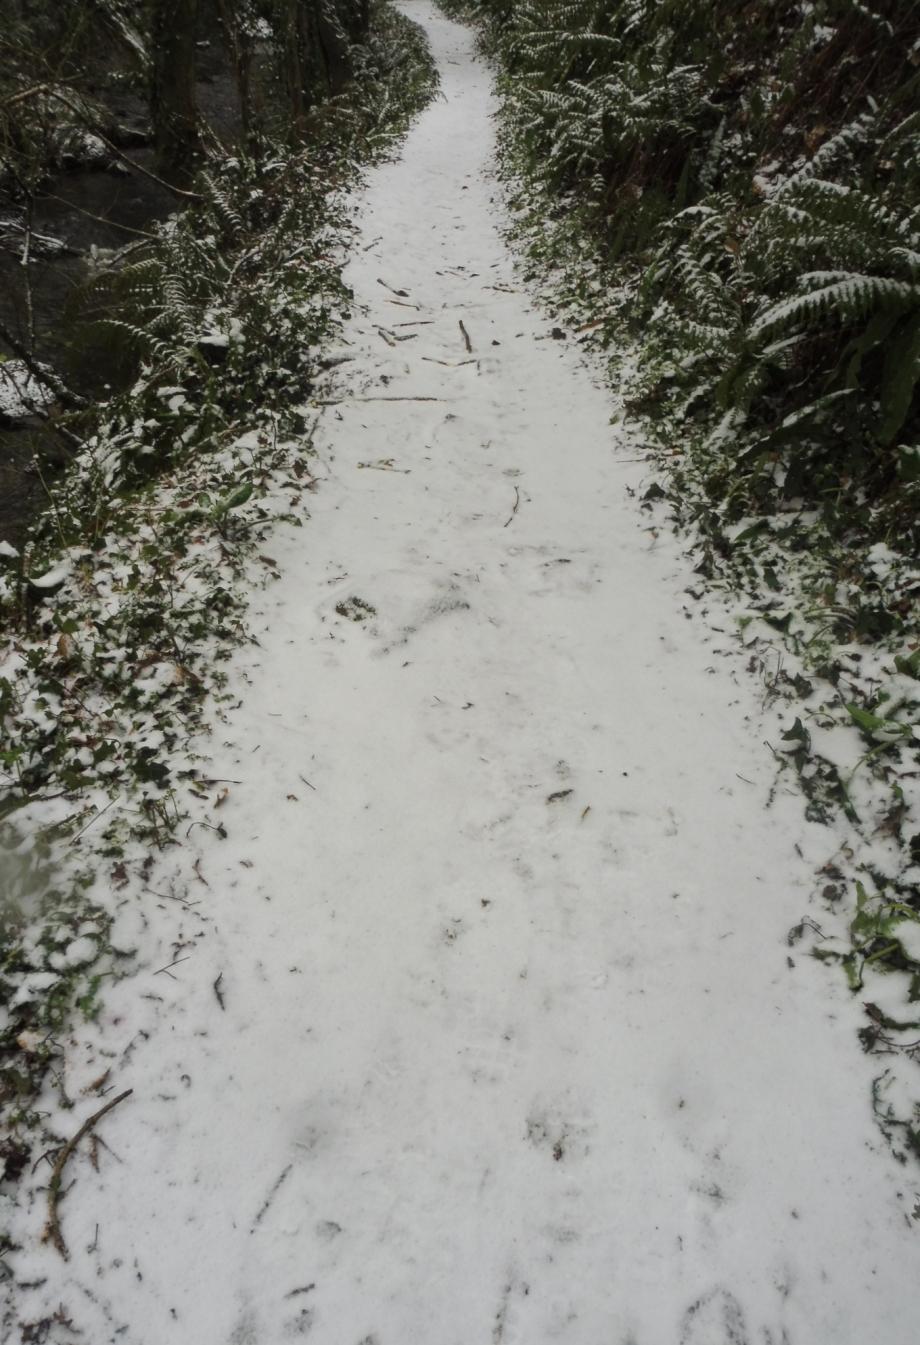 Gel et neige flora 01 03 2018 018pm.jpg